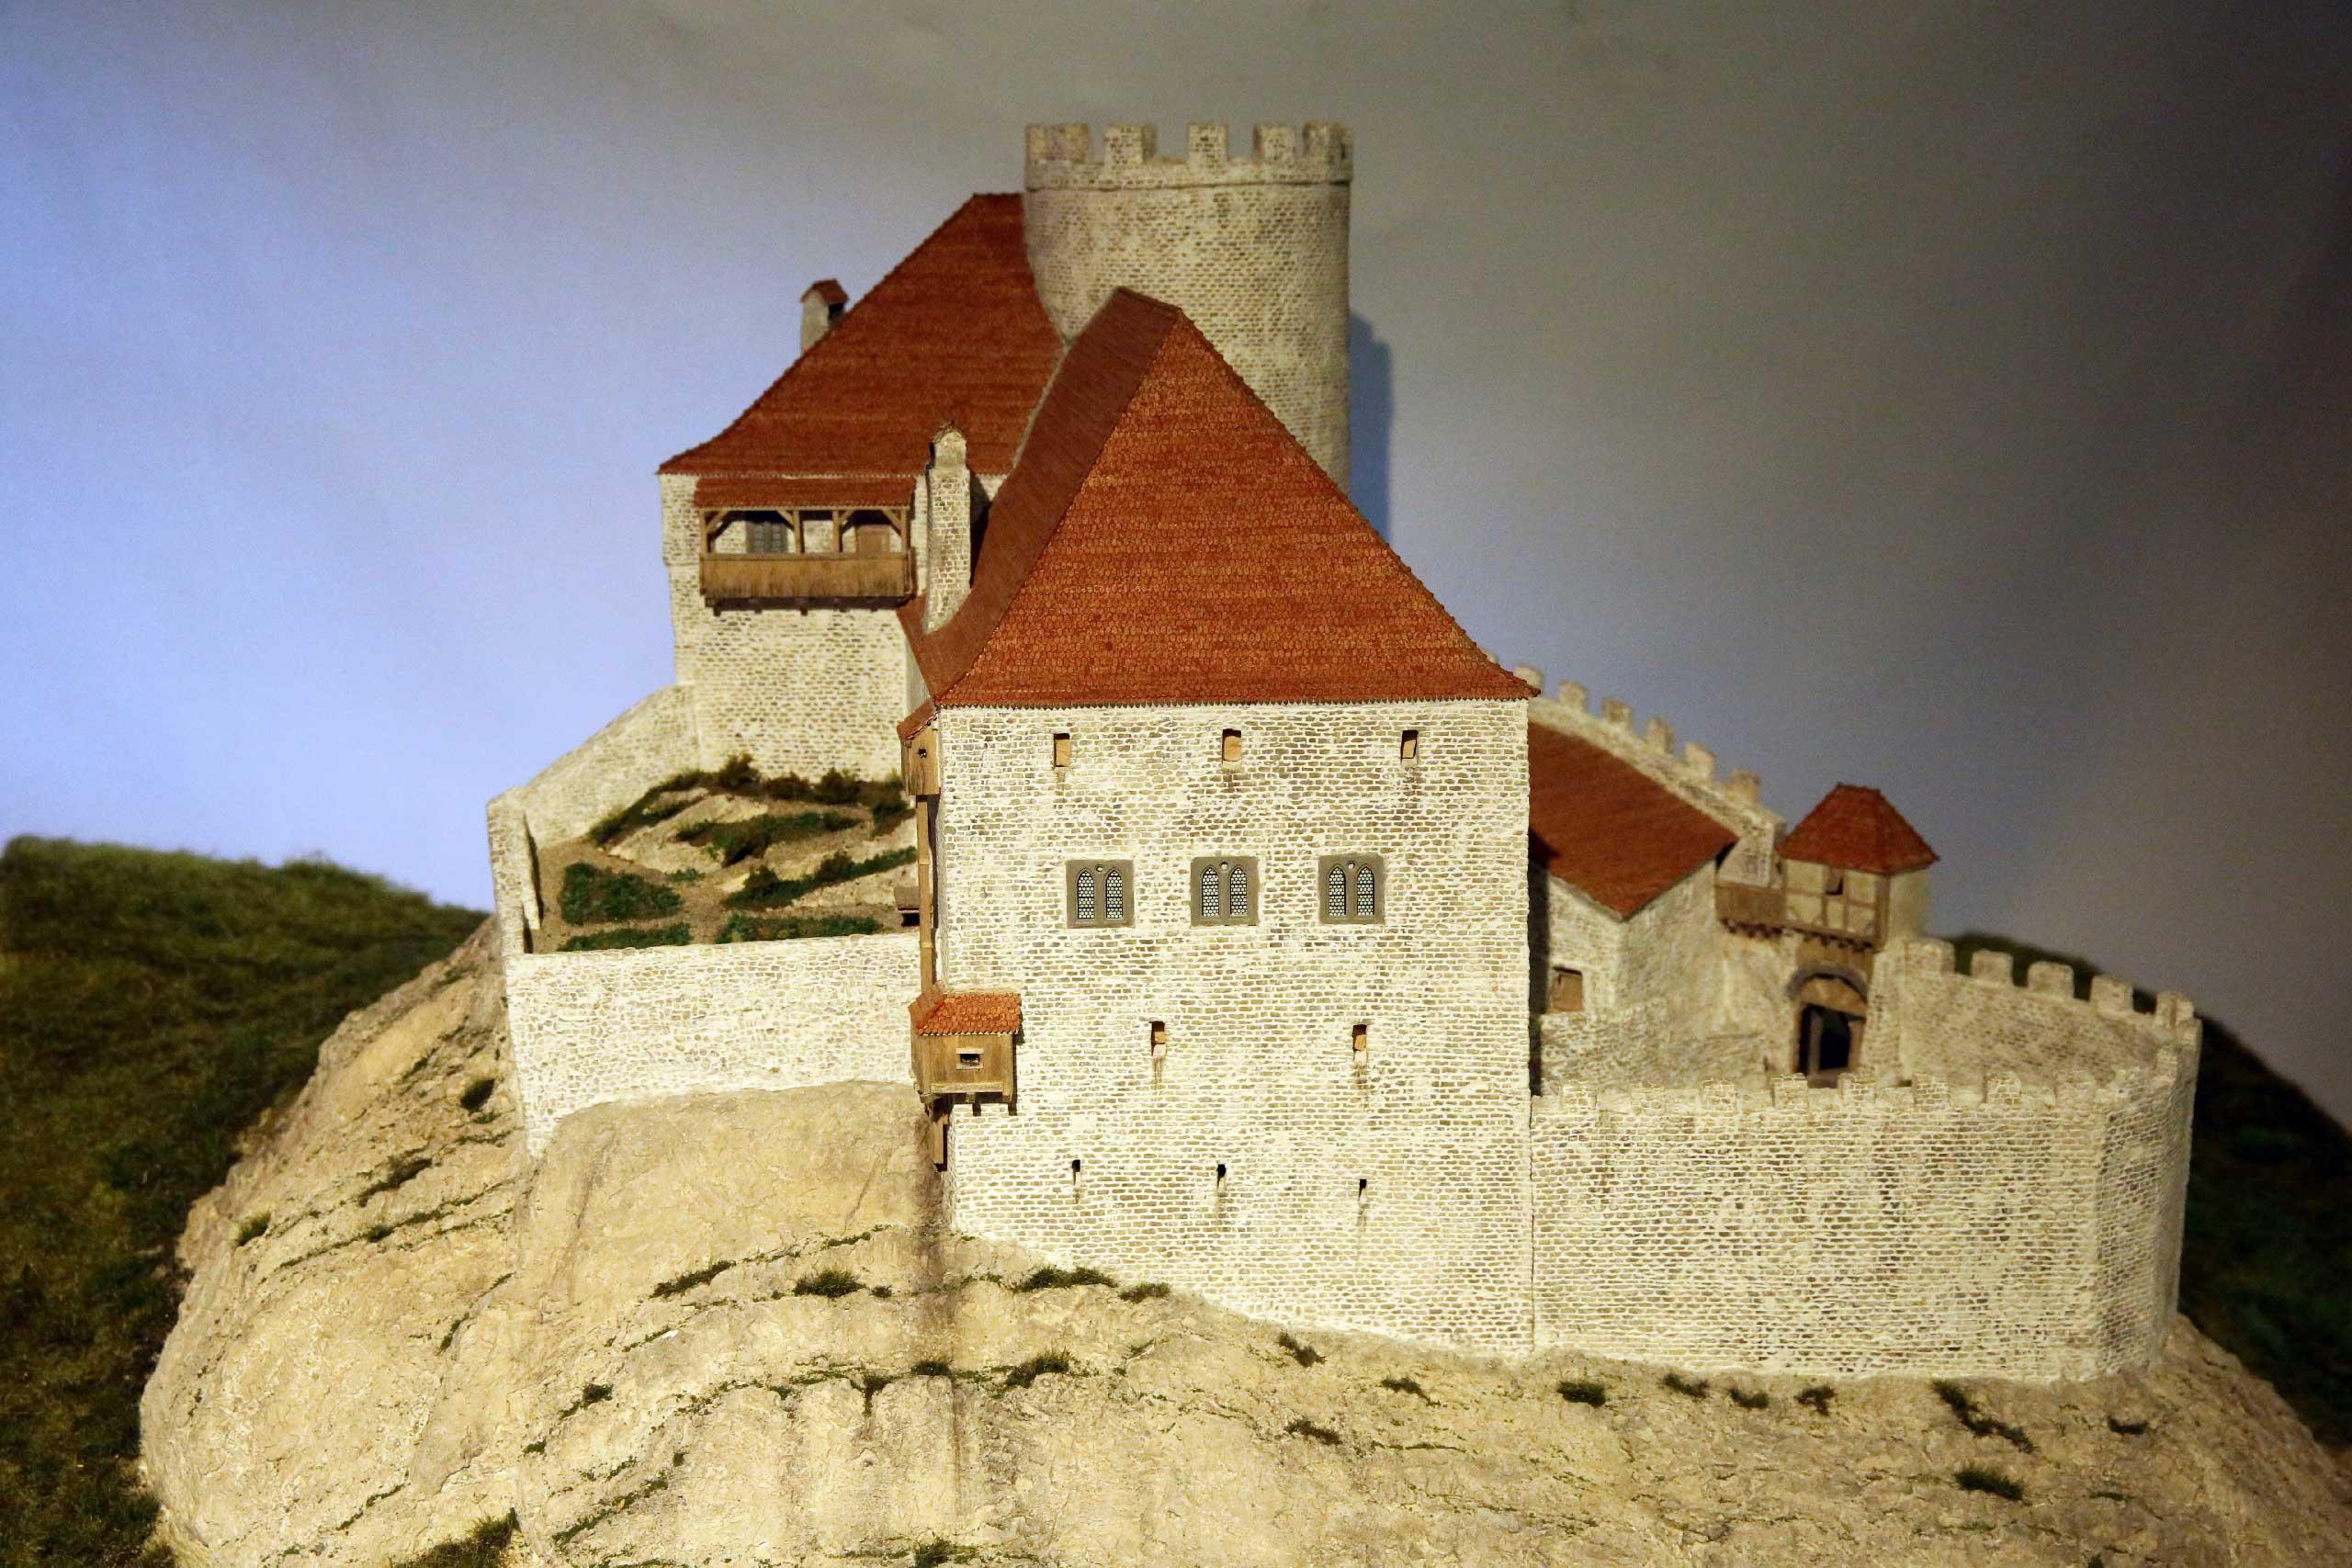 dorfmuseum-wilderwil-modell-ruine-unspunnen